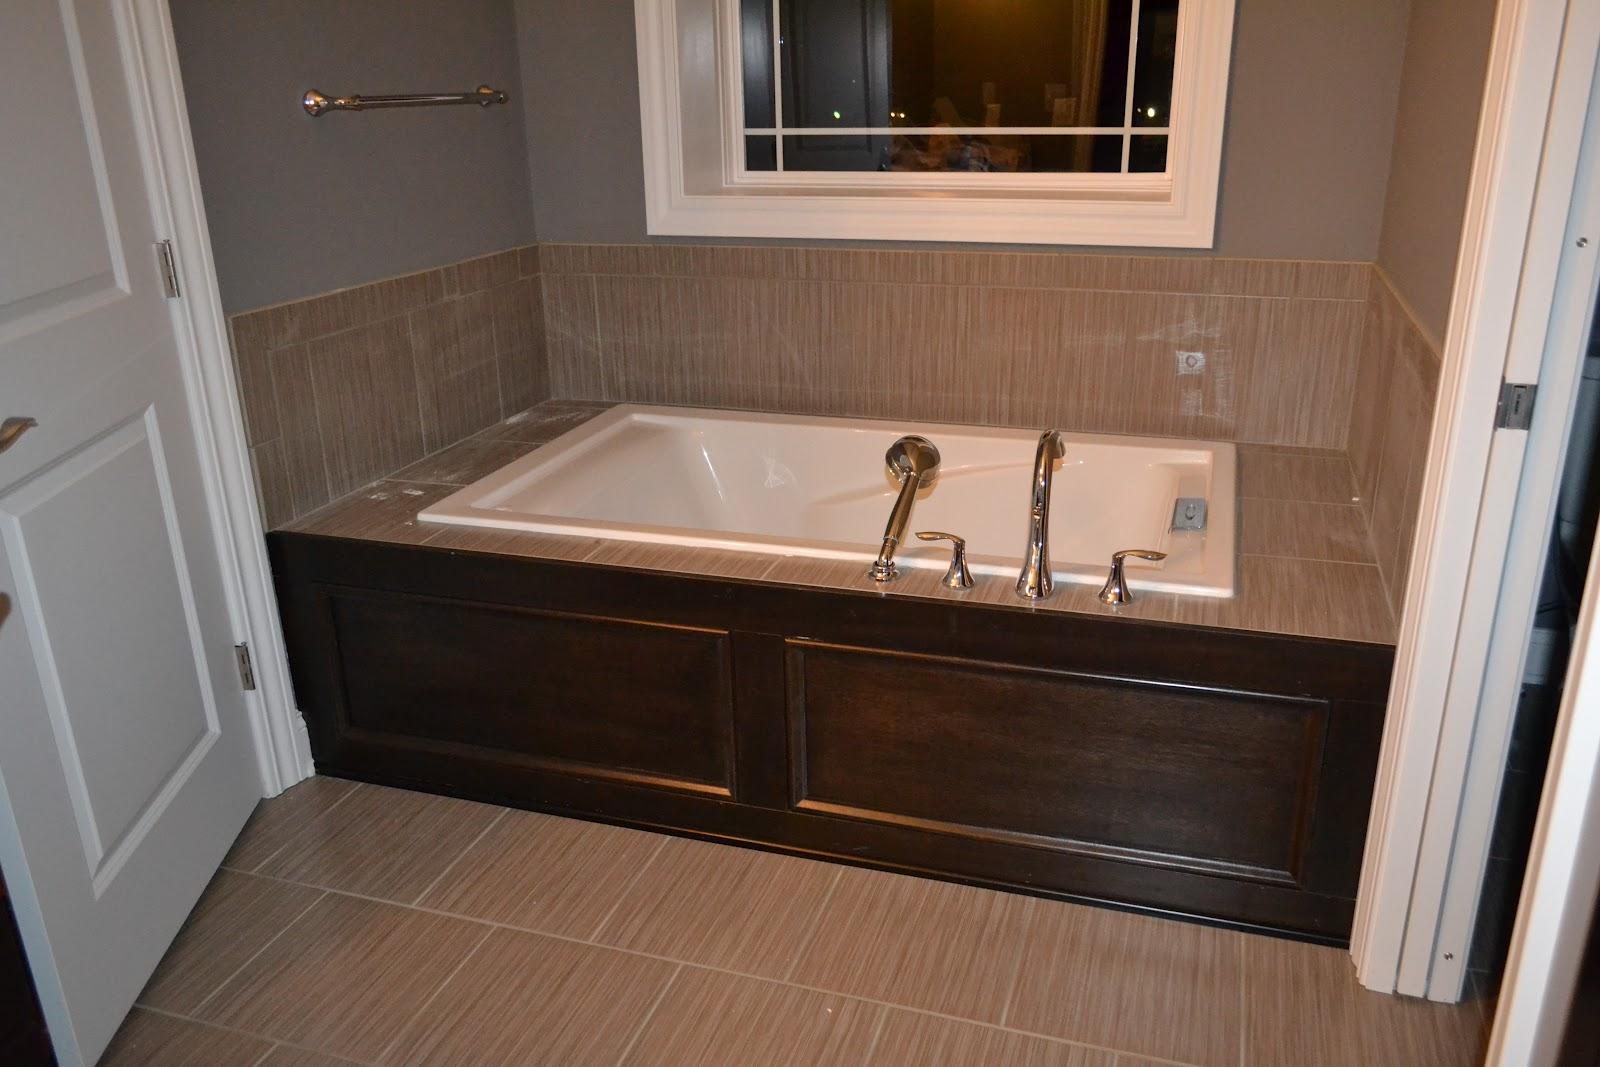 bathroom-interior-extraordinary-bathroom-decoration-ideas-using-light-brown-porcelain-tile-bath-surround-along-with-rectangular-white-bathtub-and-light-grey-bathroom-wall-paint-fancy-bathroom-interio